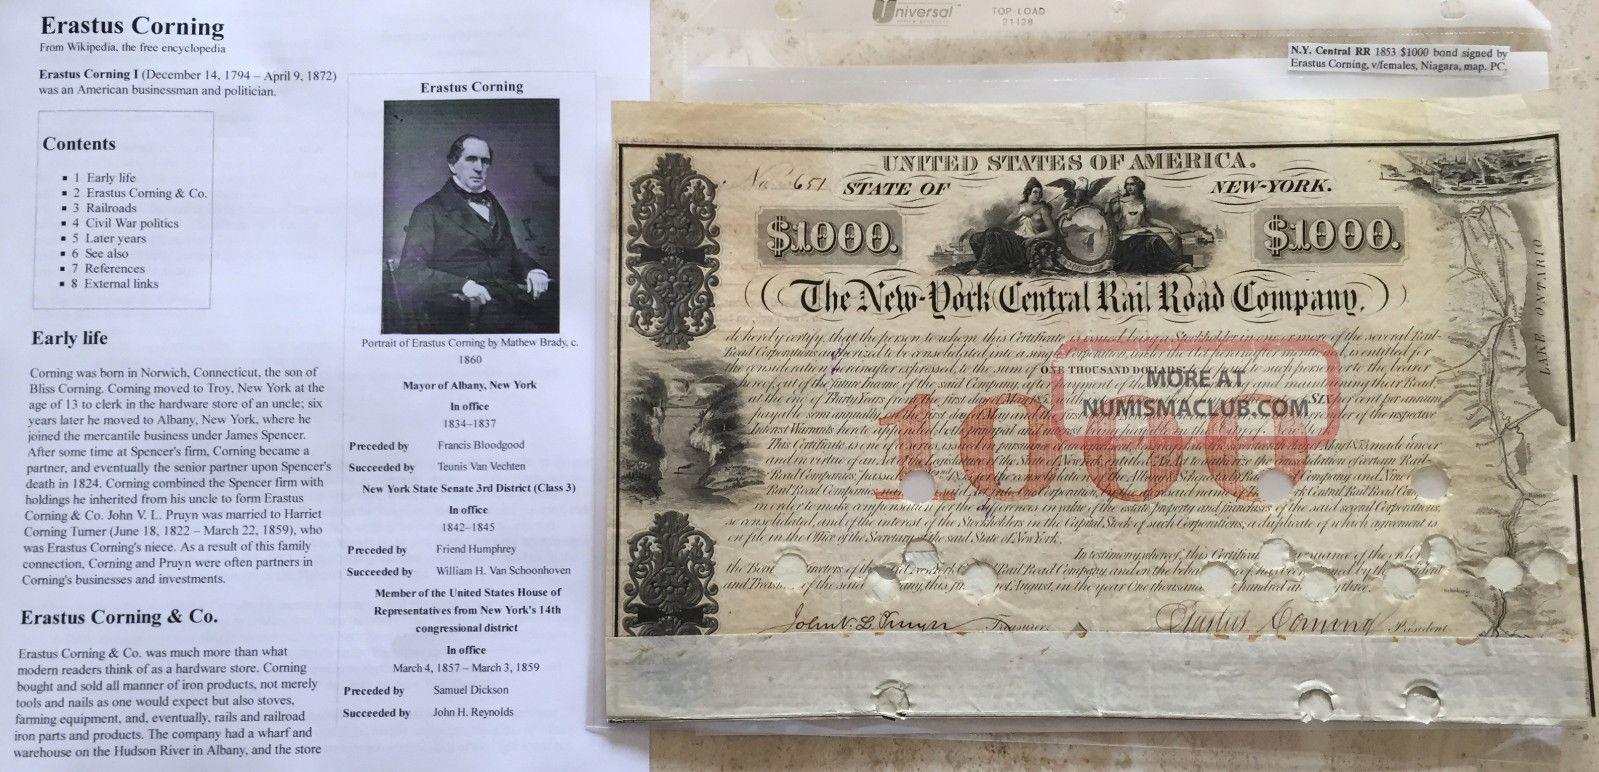 Civil War Congressman Ny Ironclad Industrialist Document Signed Railroad Bond Stocks & Bonds, Scripophily photo